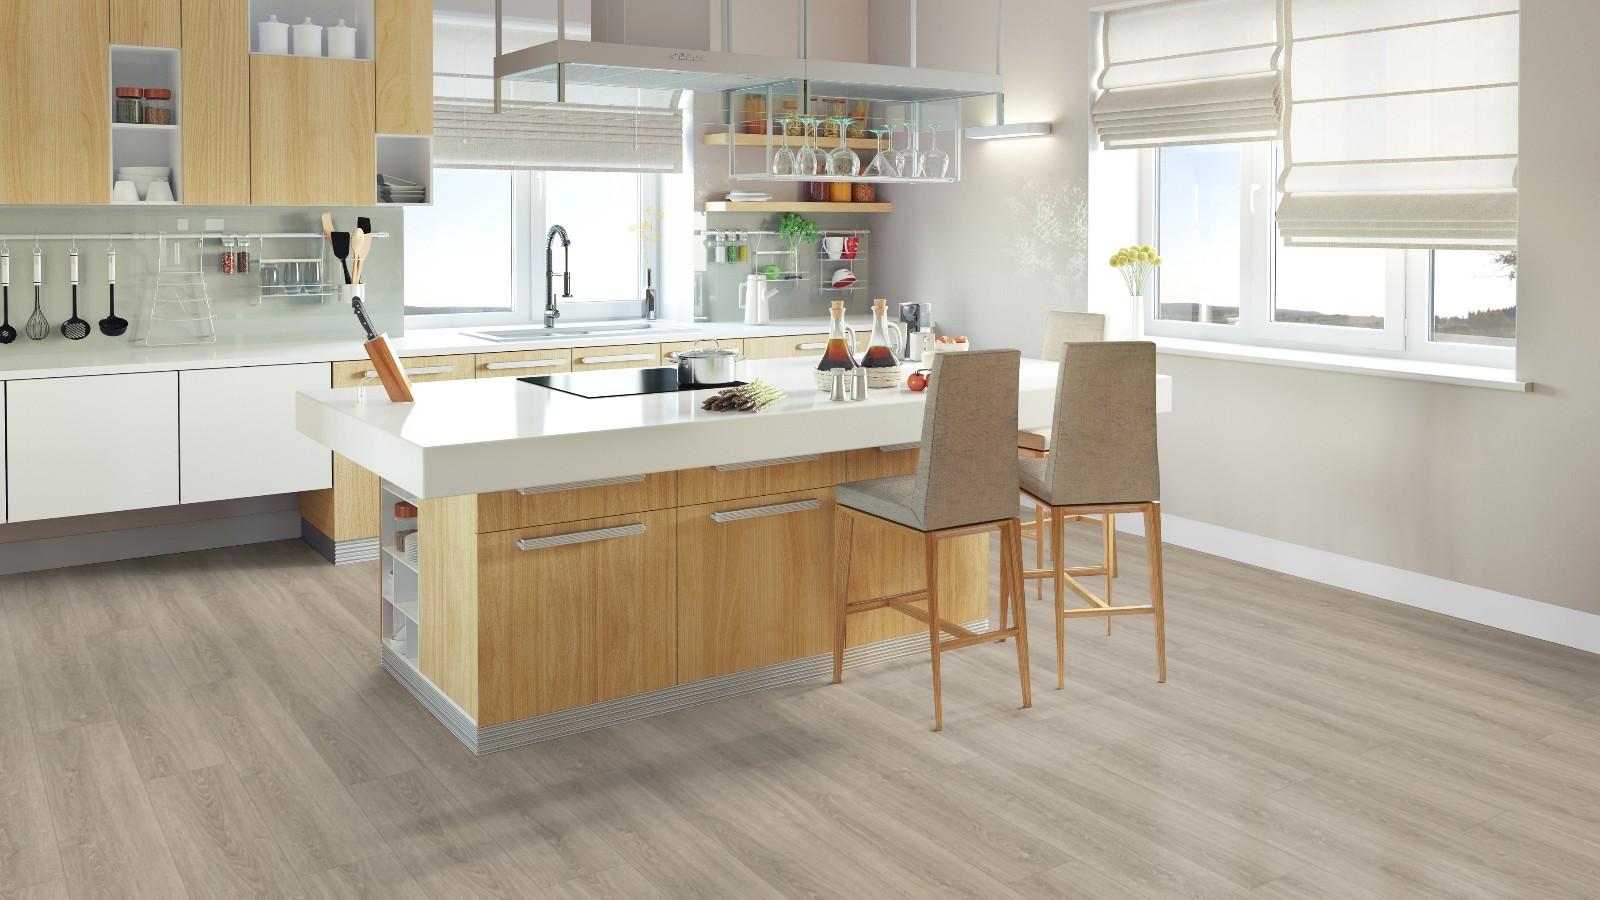 terh rne vinyl 5 mm klick eiche vilnius grau a05 pure choice. Black Bedroom Furniture Sets. Home Design Ideas